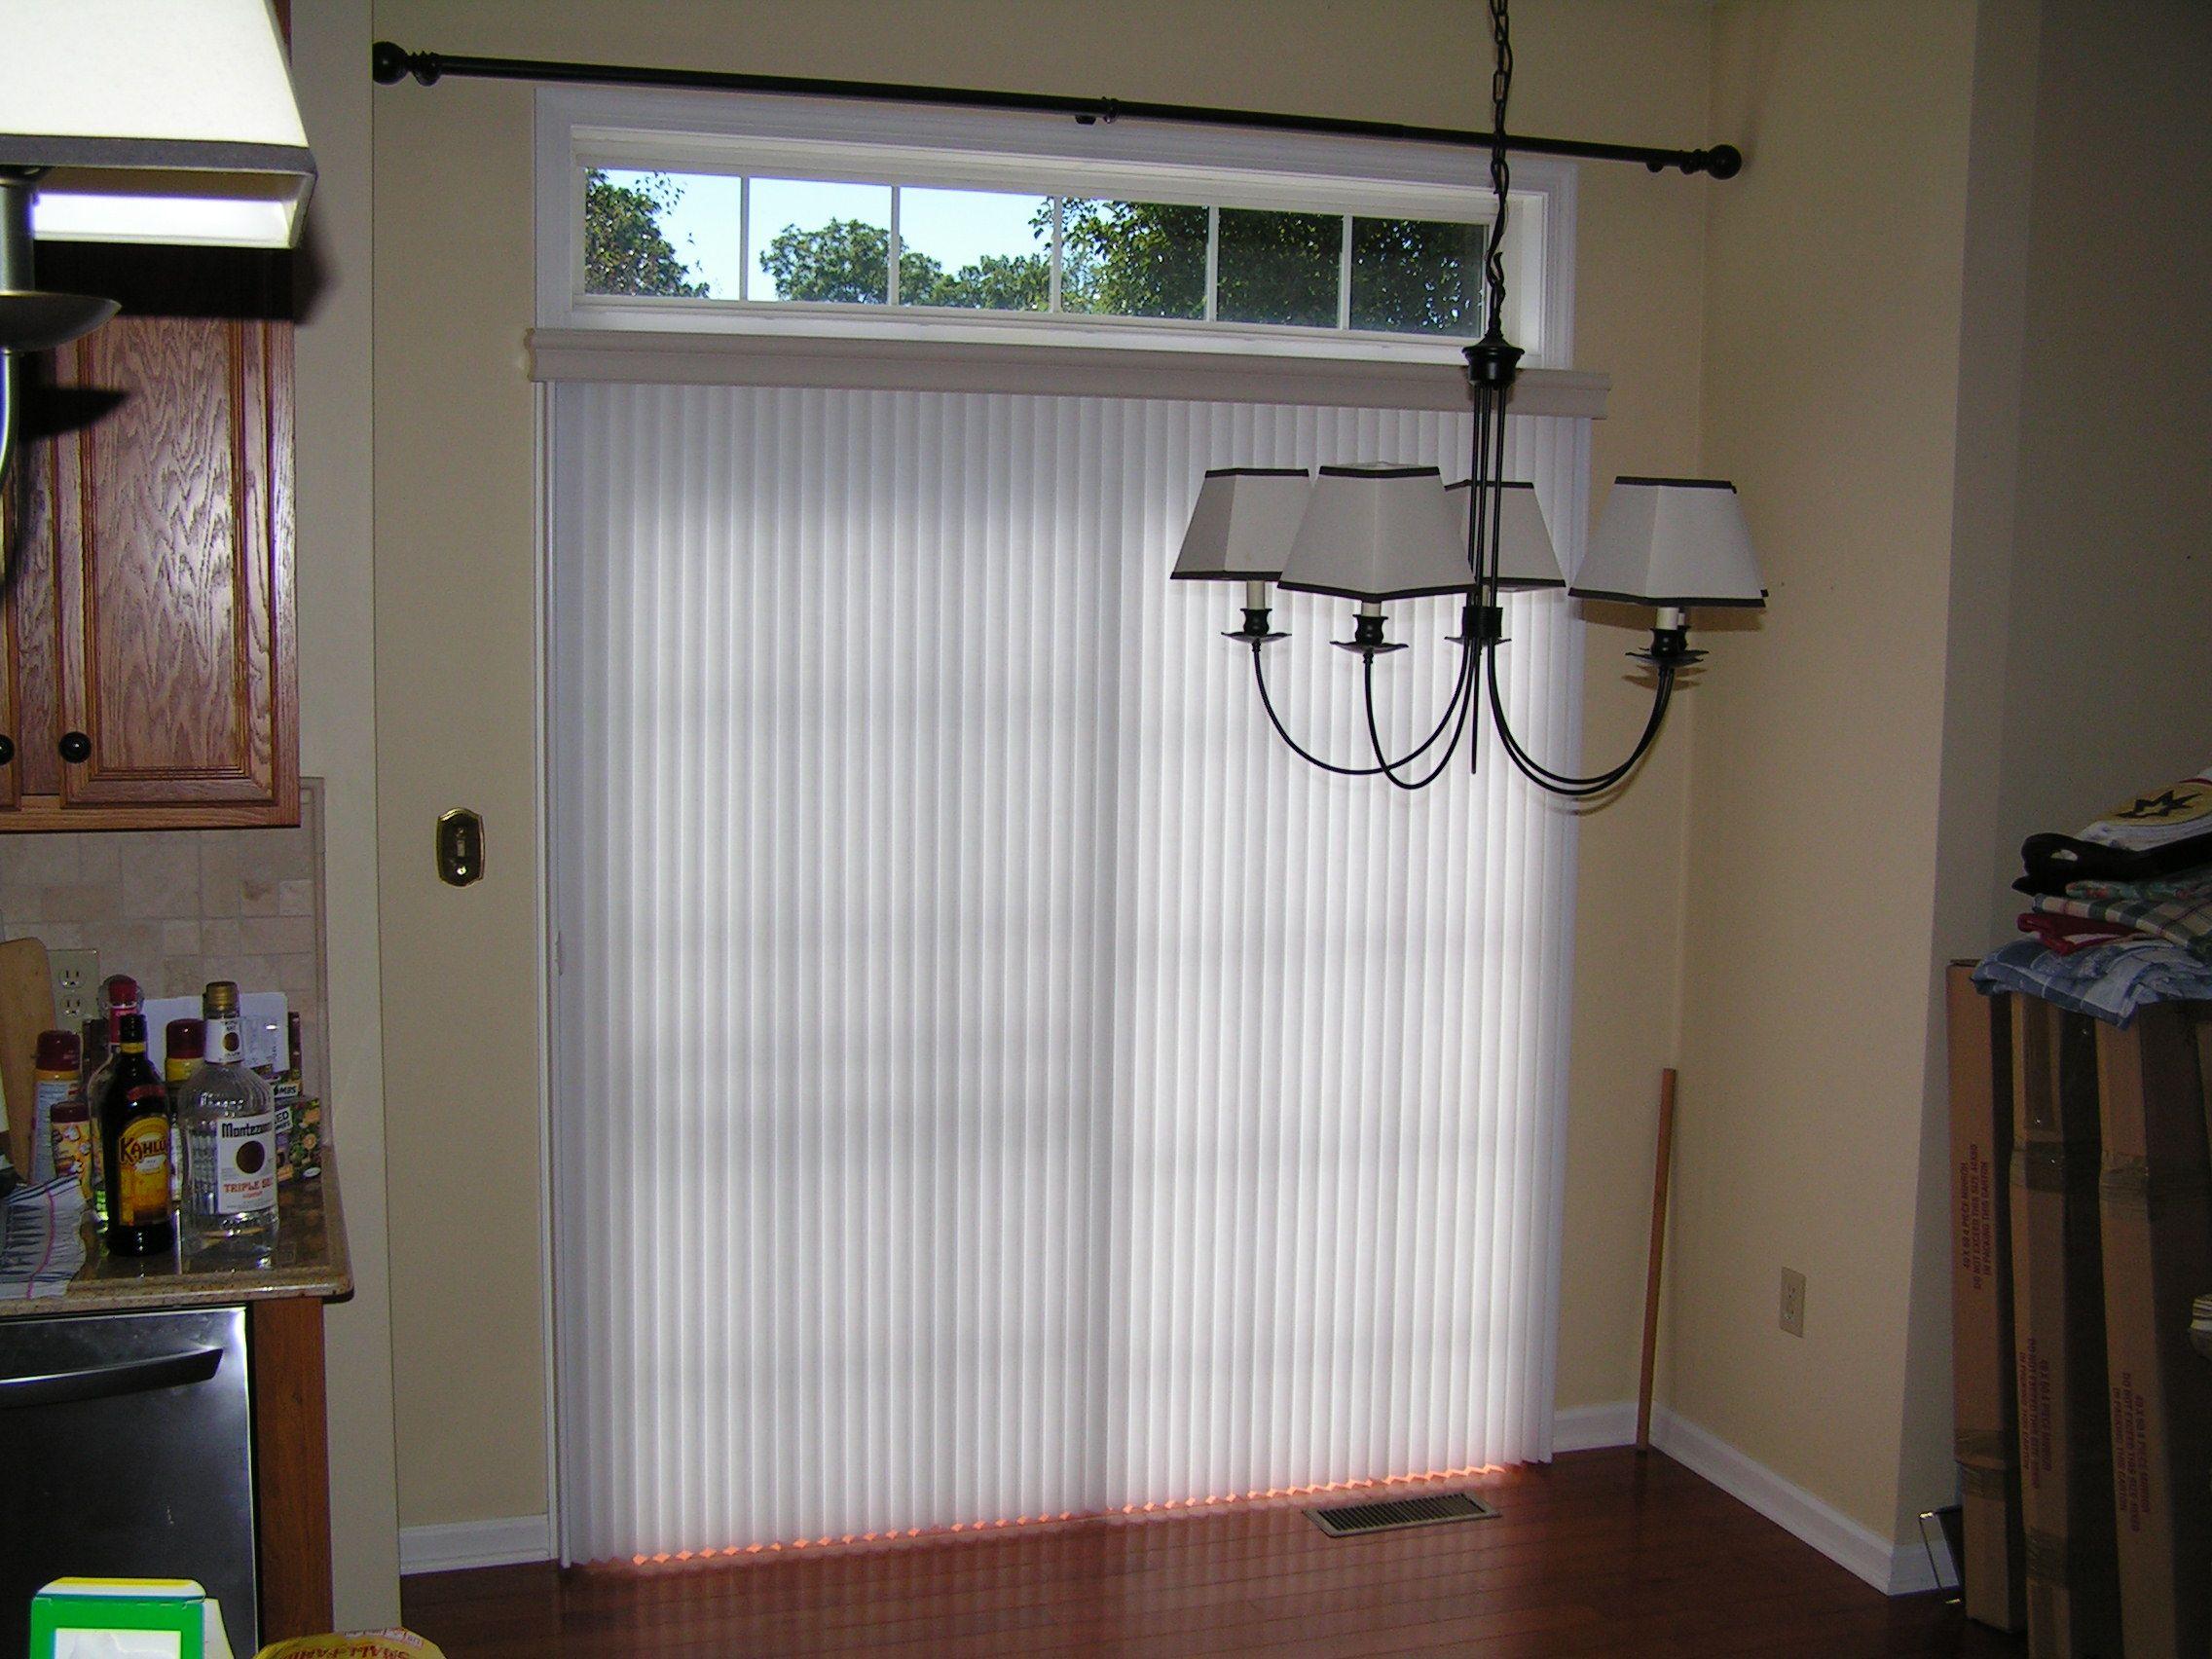 Kitchen nook window treatments  vertiglide architella duette honeycomb shade in dazzling white for a